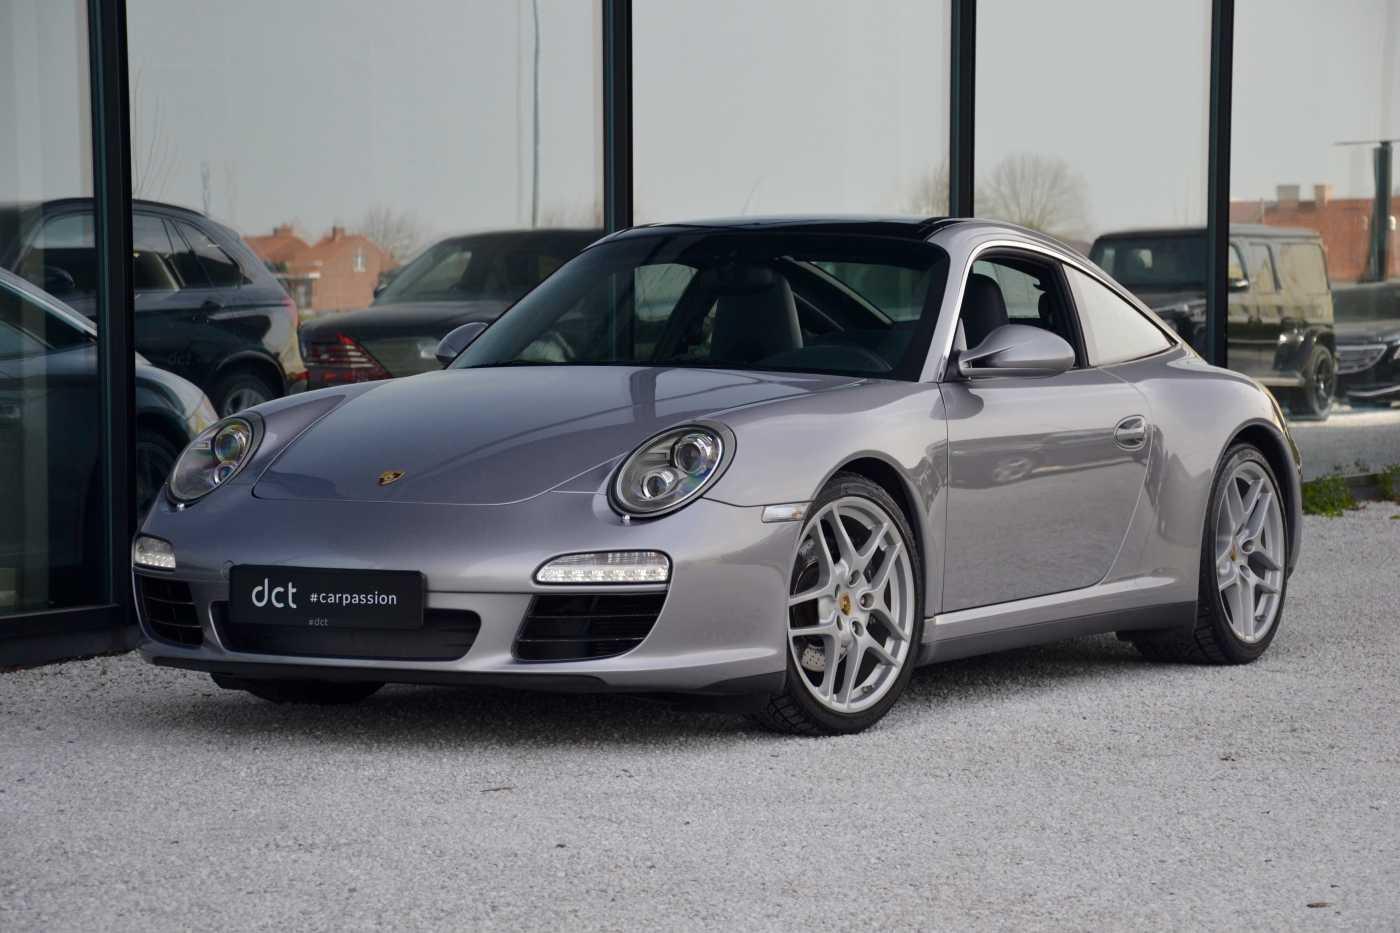 Porsche 997.2 Carrera 4